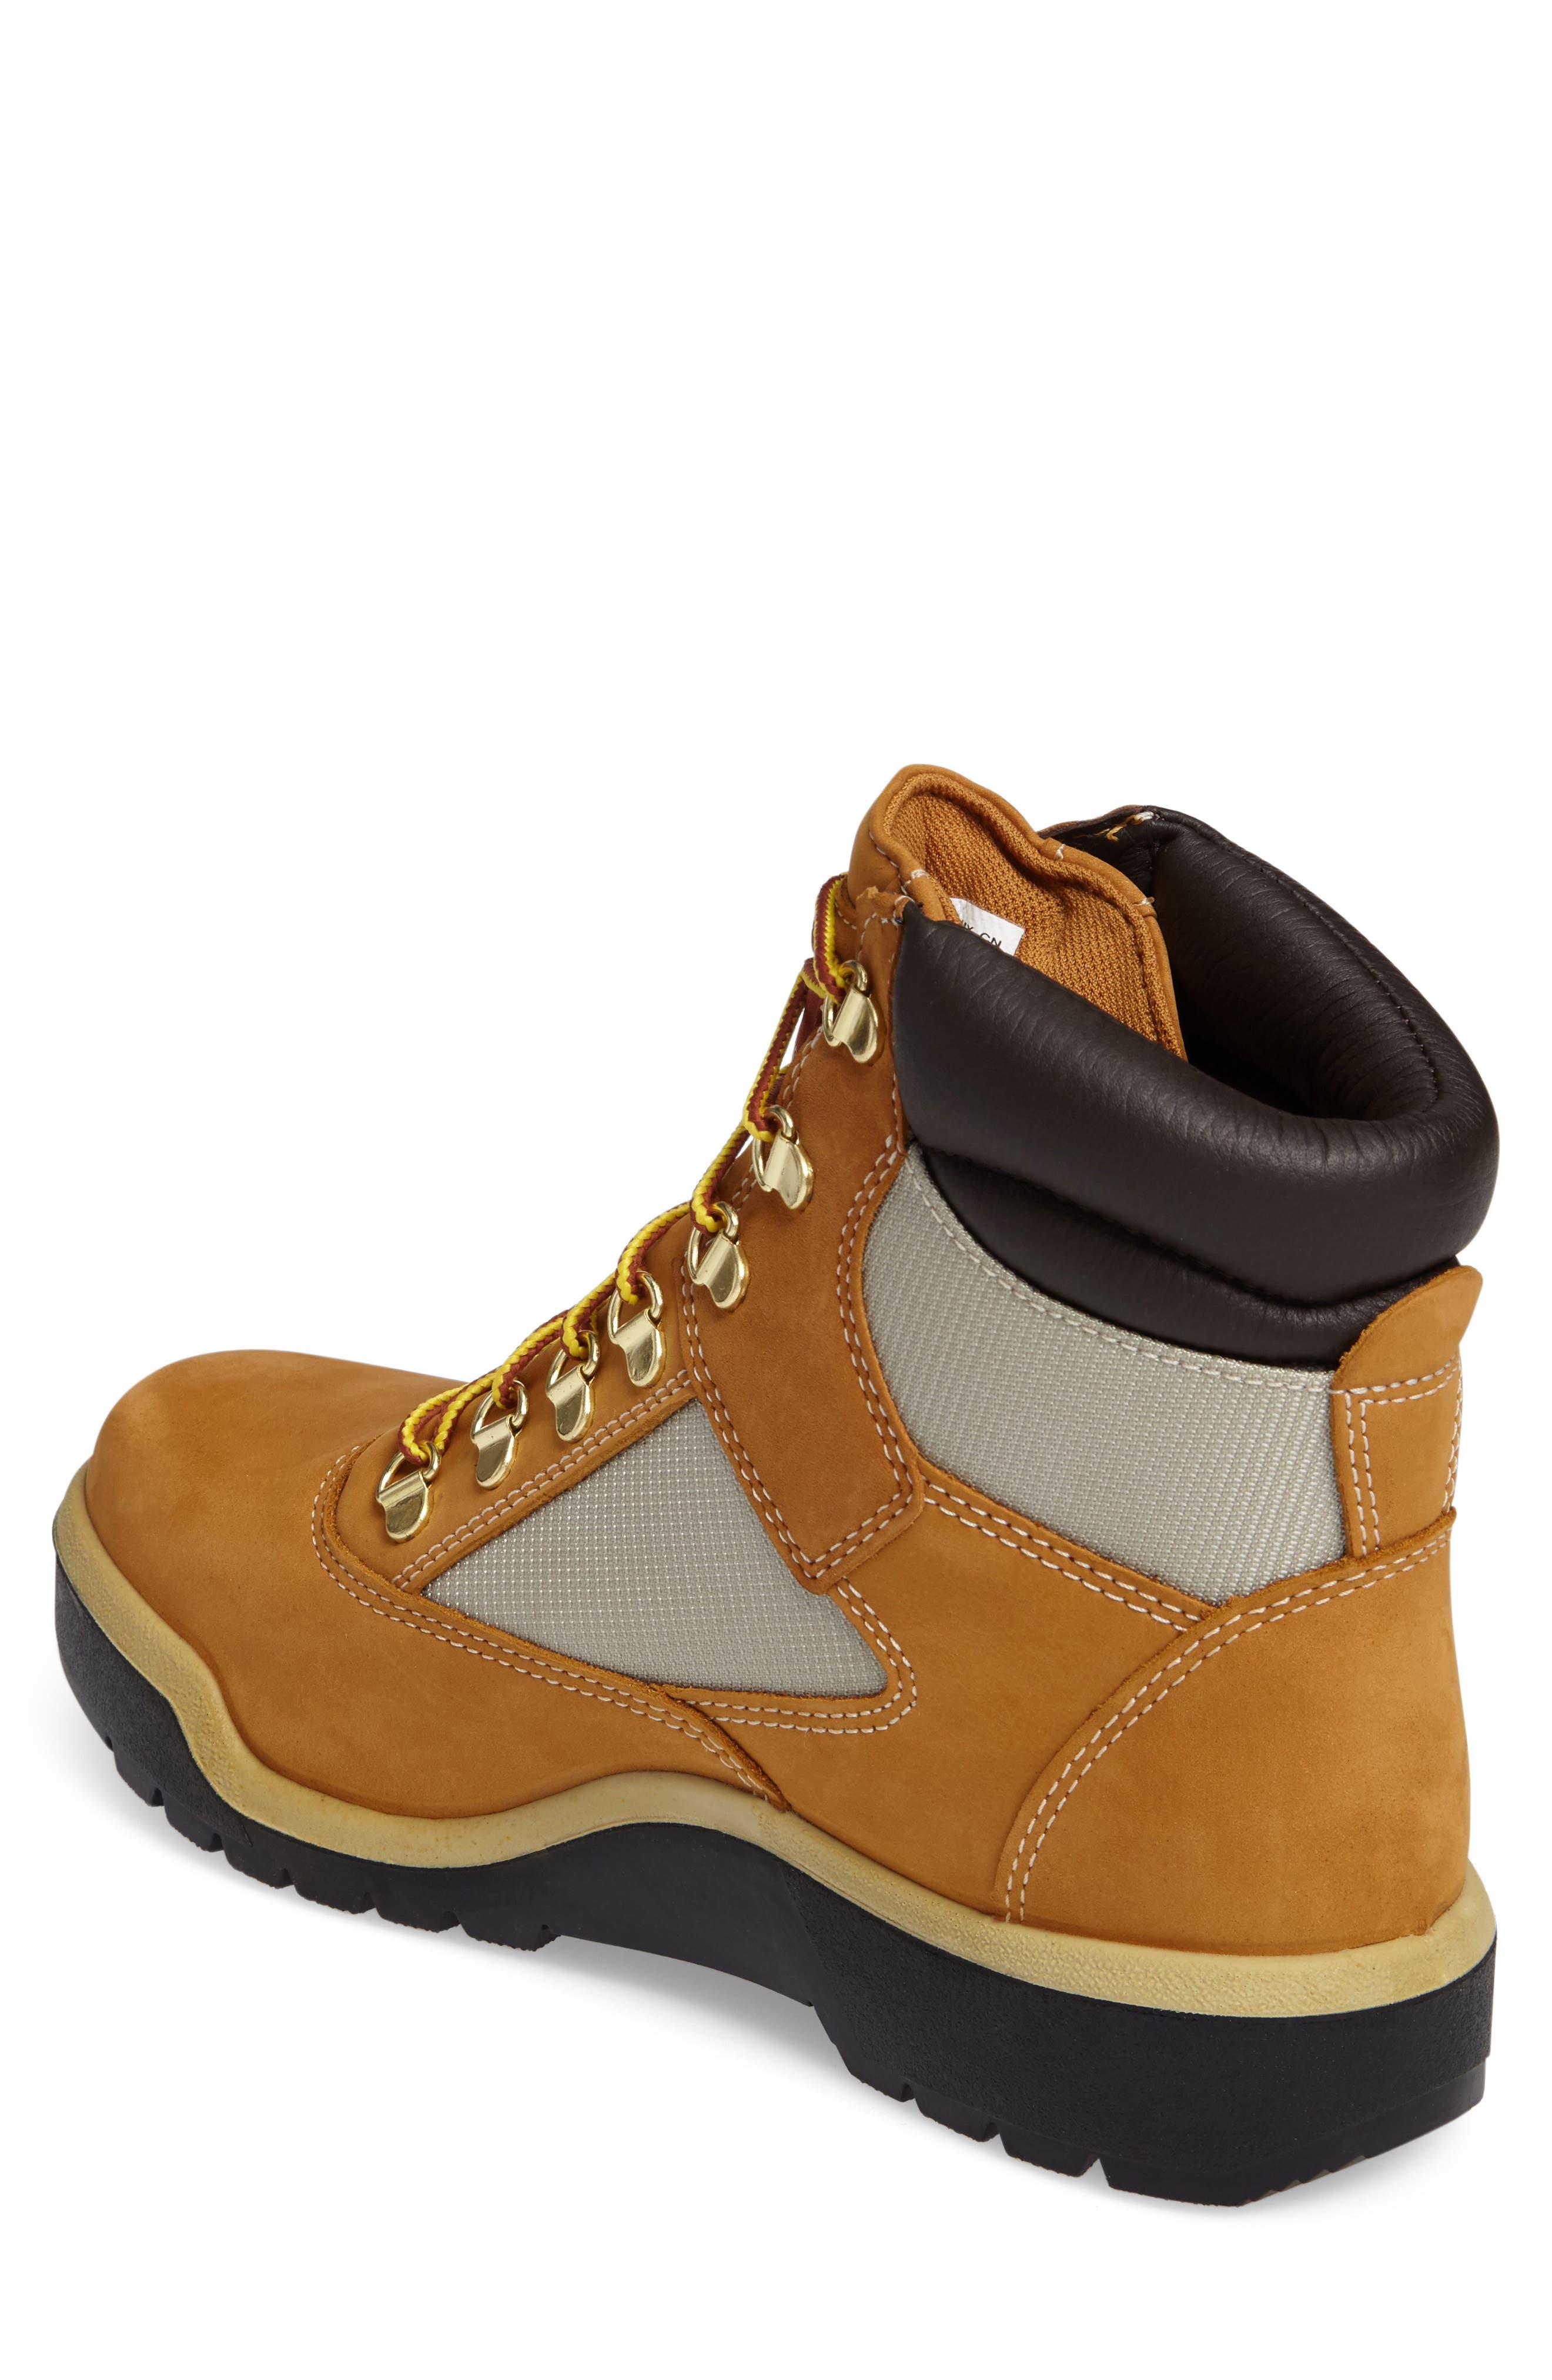 Field Waterproof Boot,                             Alternate thumbnail 16, color,